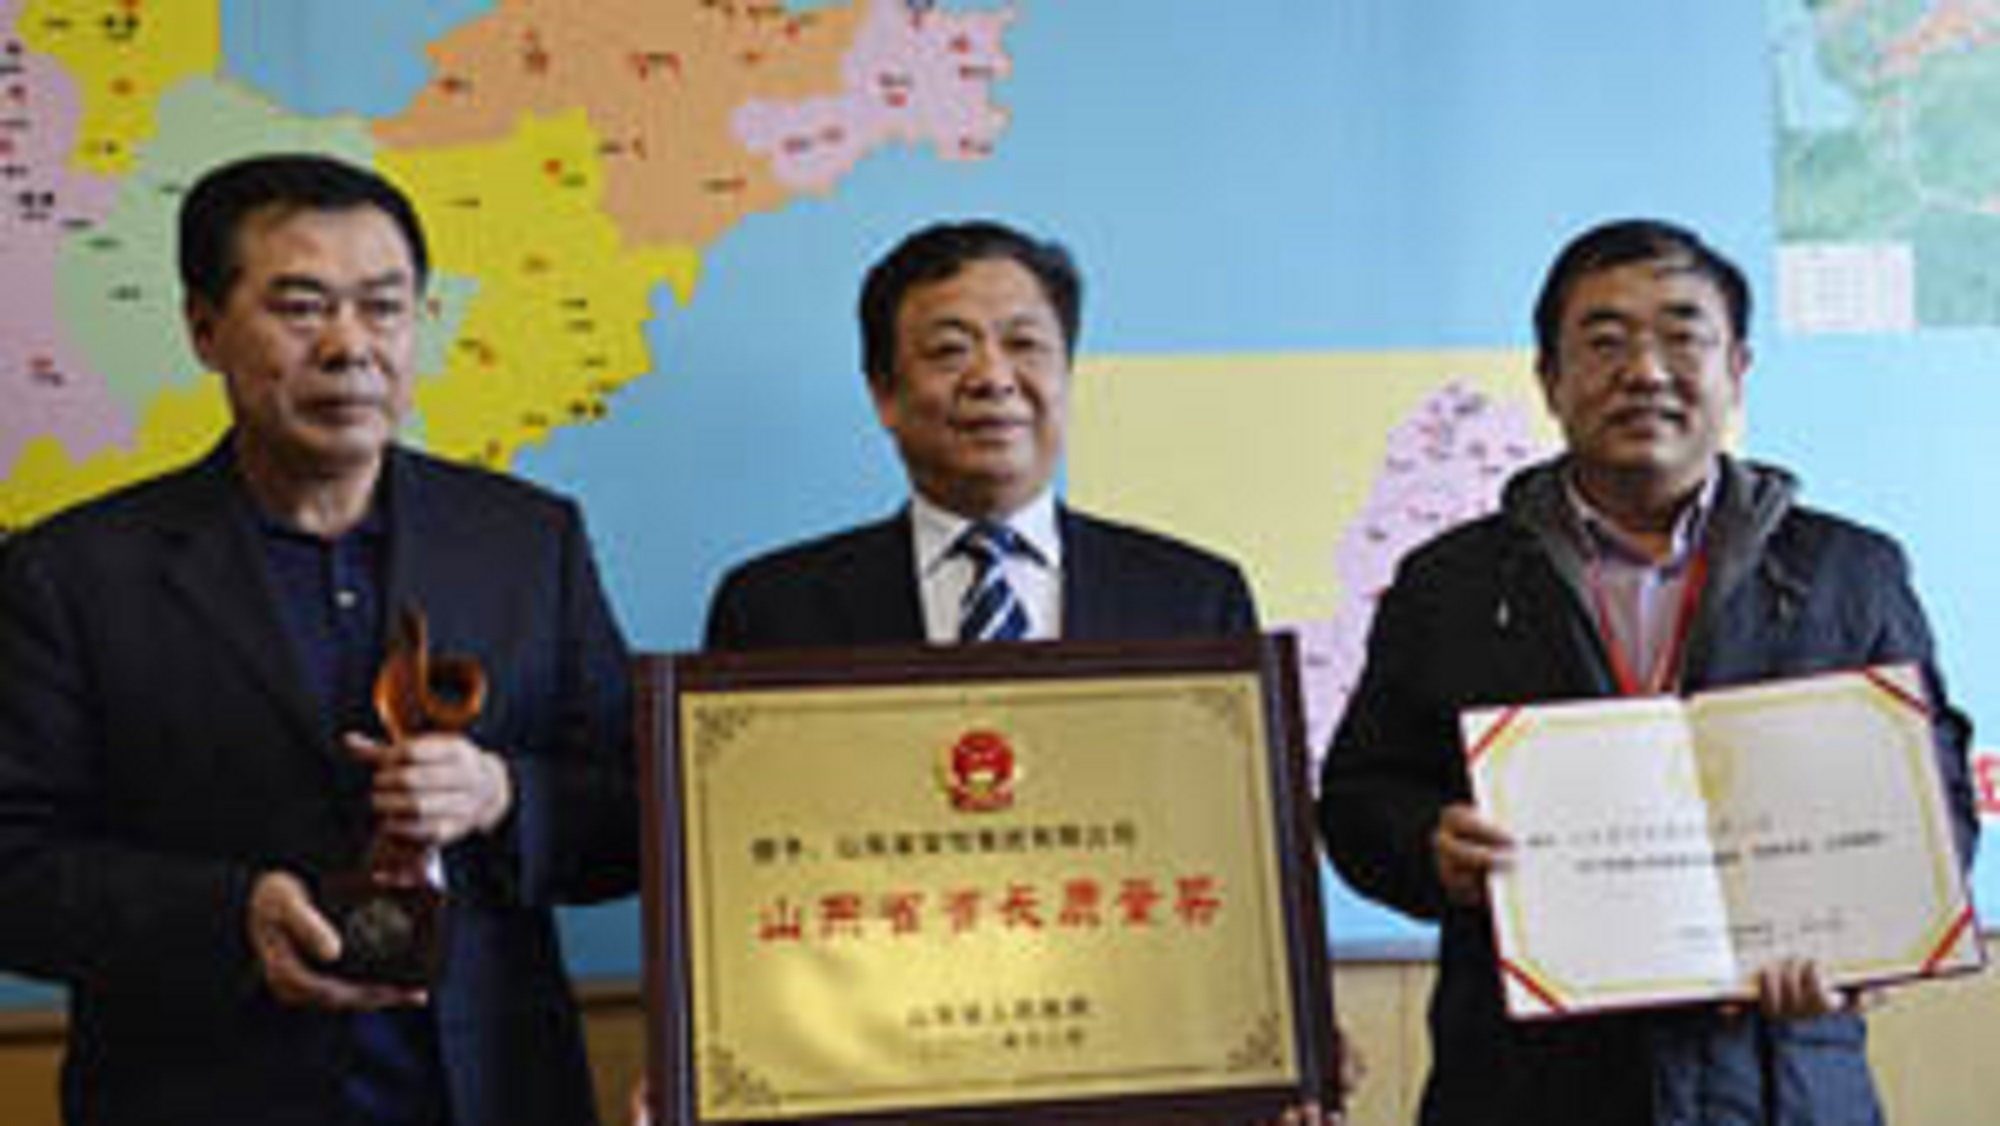 Shangdongprovincegovernor